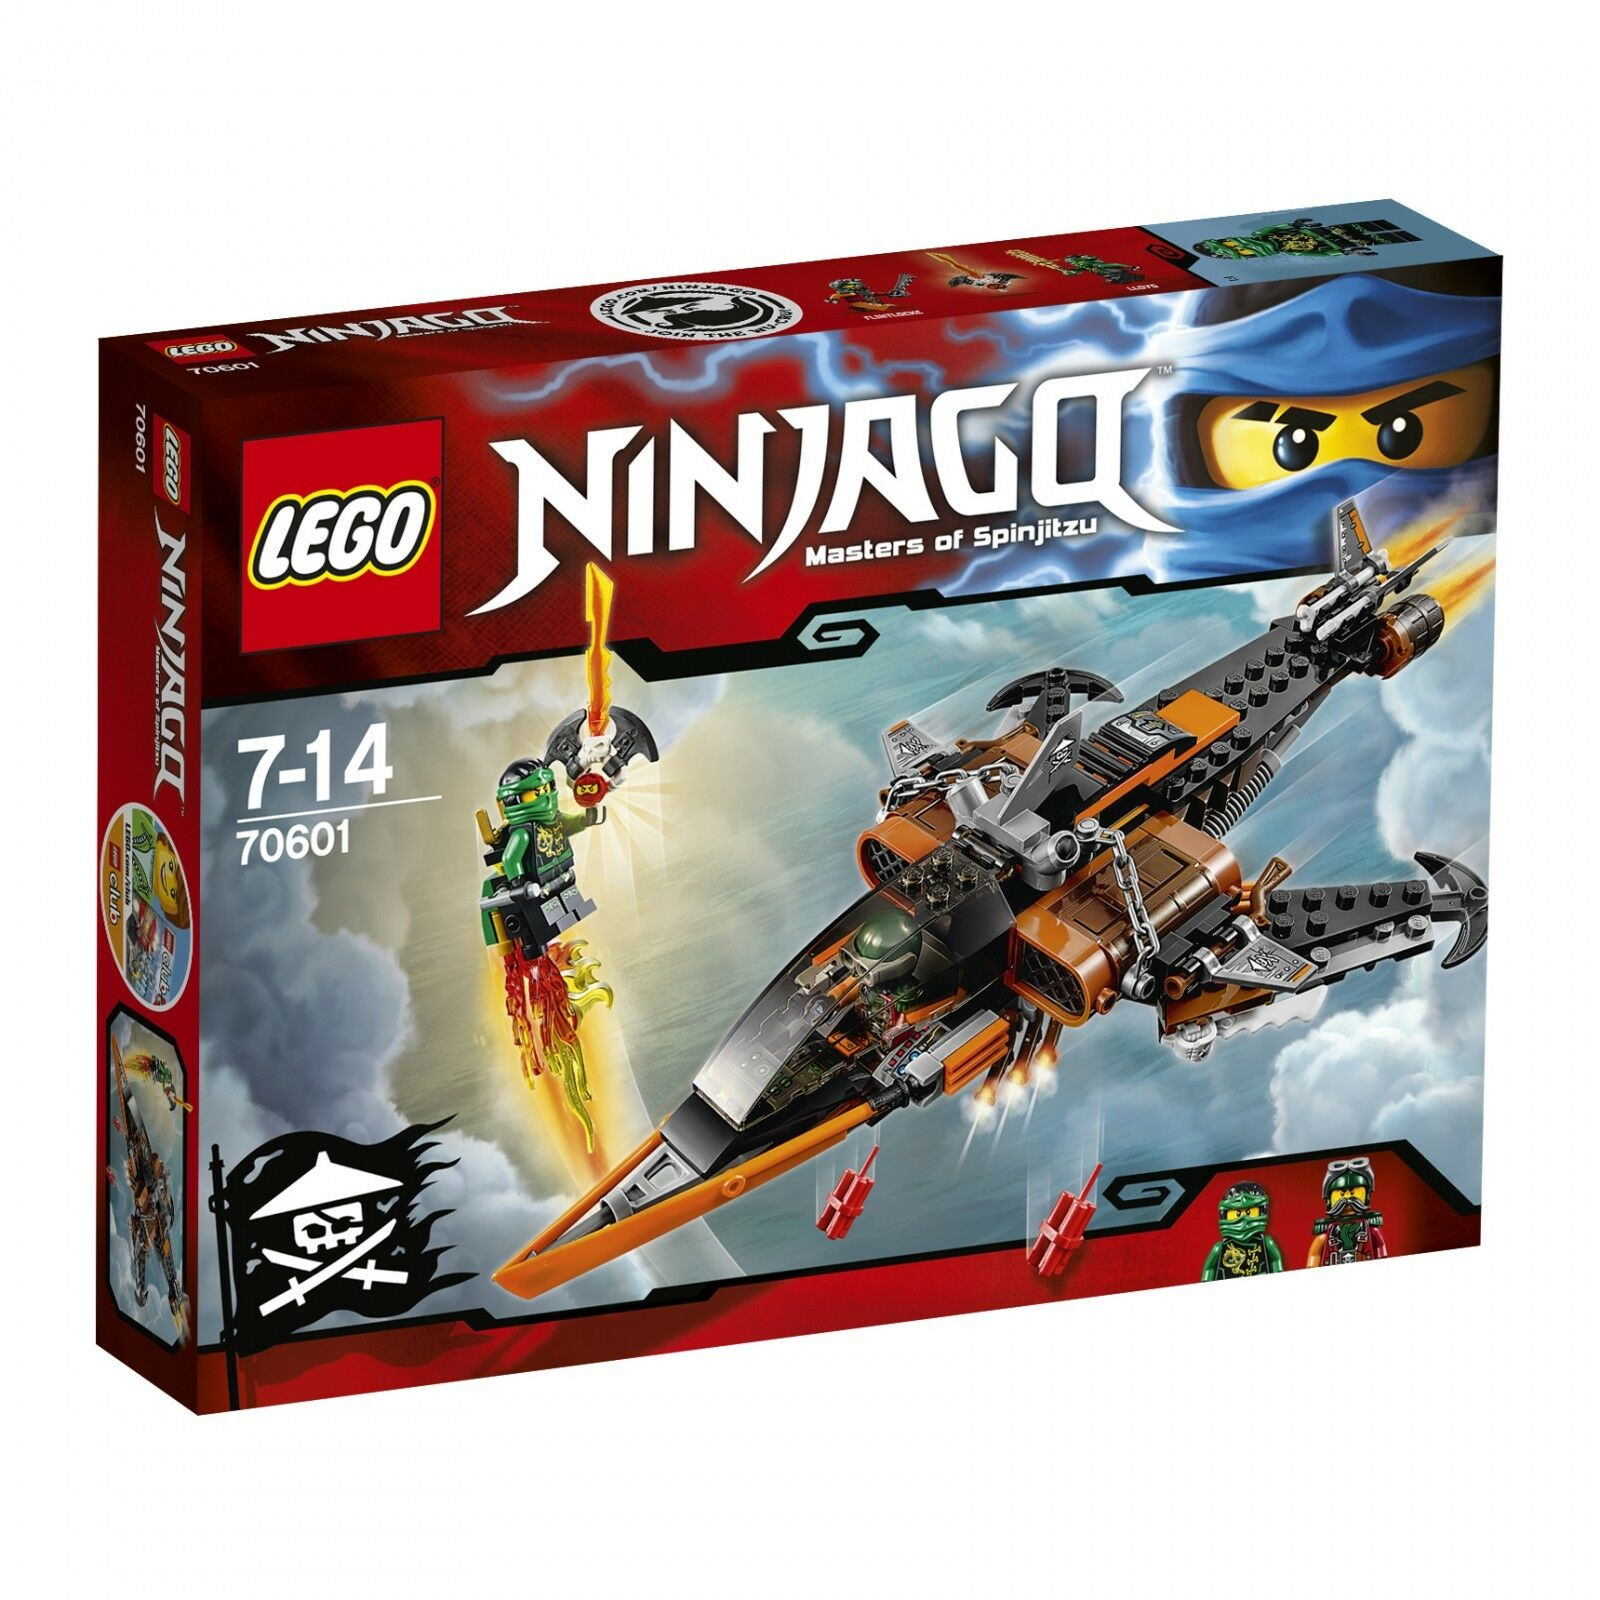 LEGO ® Ninjago ™ 70601 Air-Requin NEUF neuf dans sa boîte _ Sky Shark NEW En parfait état, dans sa boîte scellée Boîte d'origine jamais ouverte